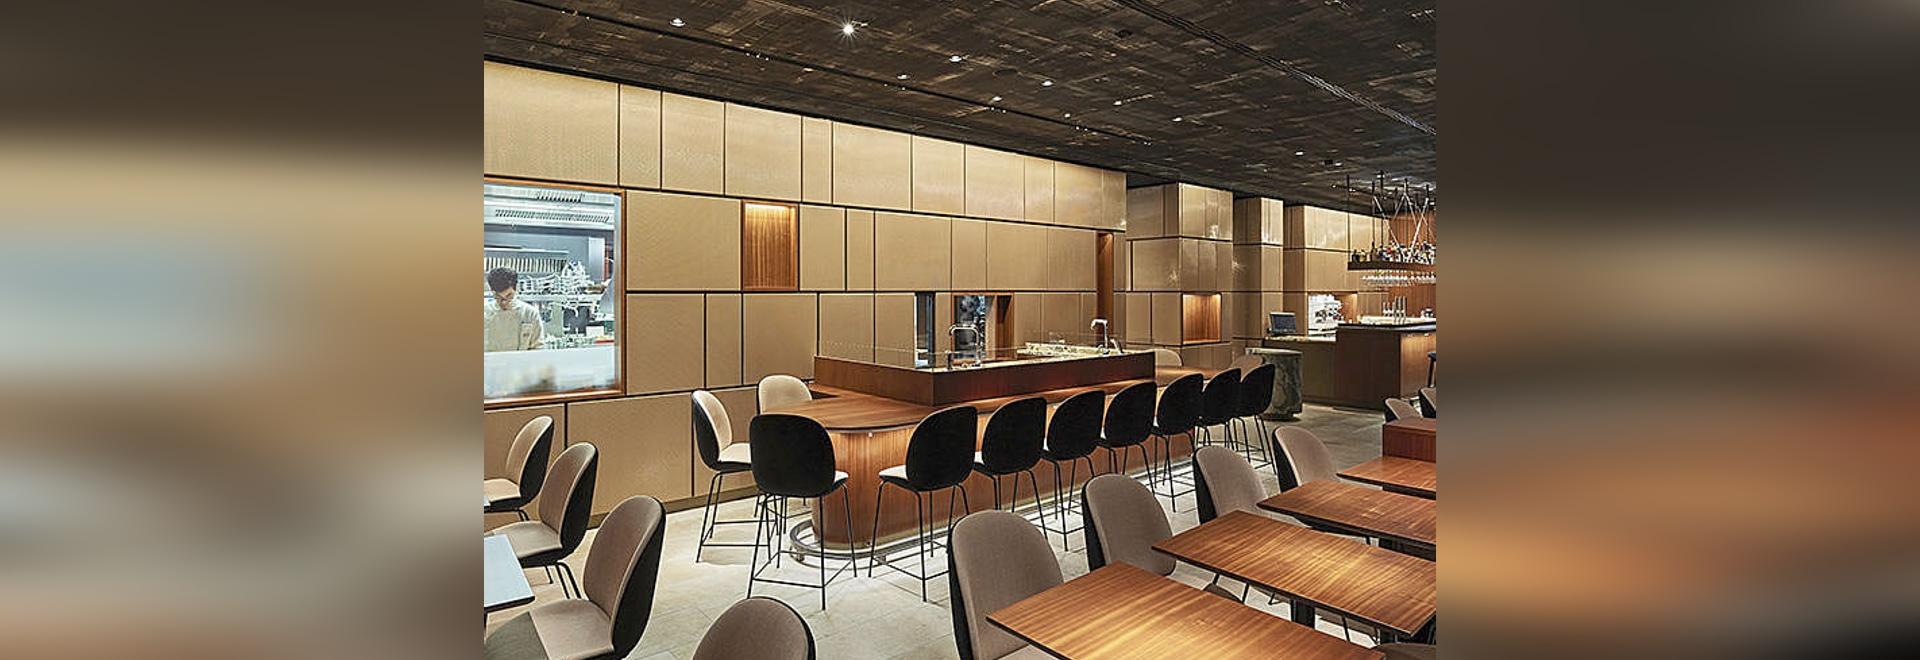 Interior Design with HAVER Architectural Mesh.